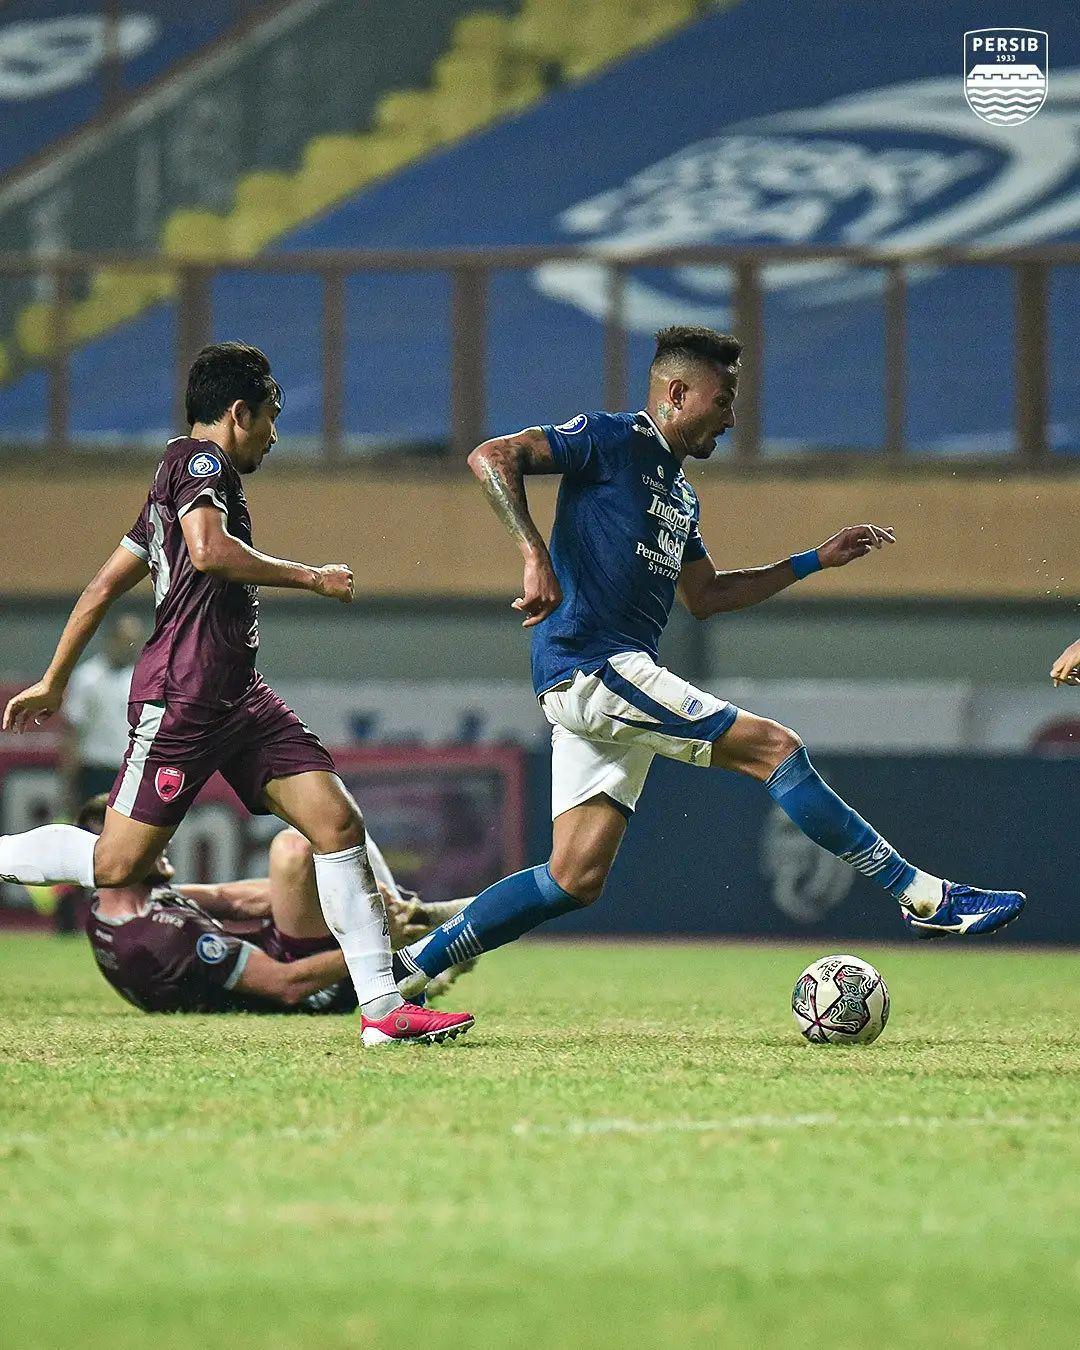 Aksi pemain Persib Bandung, Wander Luiz (kanan), melewati pengawalan pemain-pemain PSM Makassar dalam lanjutan Liga 1 2021-2022, Sabtu (2/10/2021).